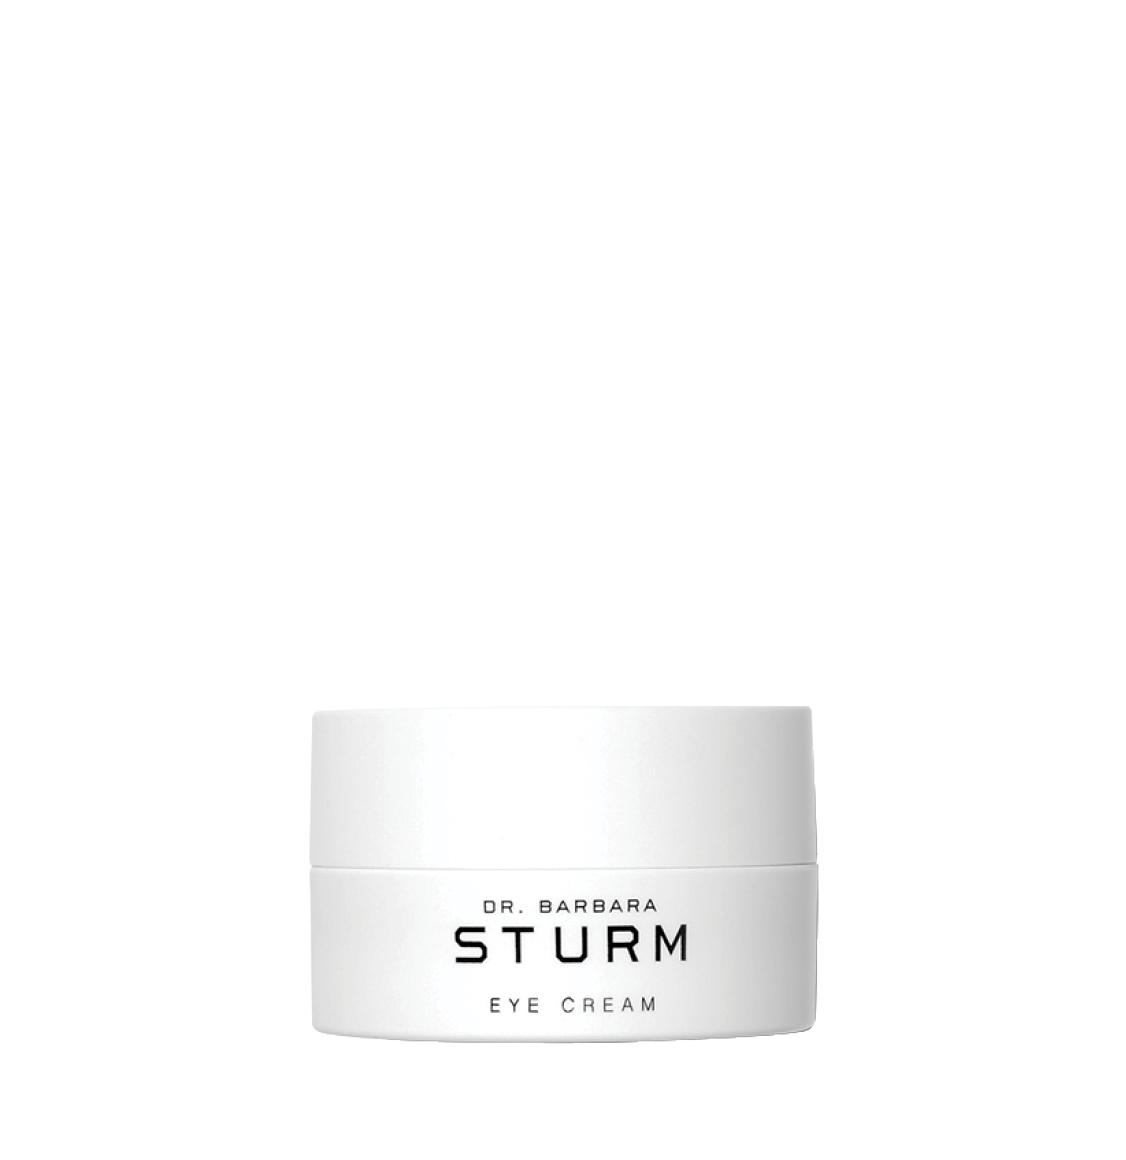 Dr. Barbara Sturm Eye Cream 15ml